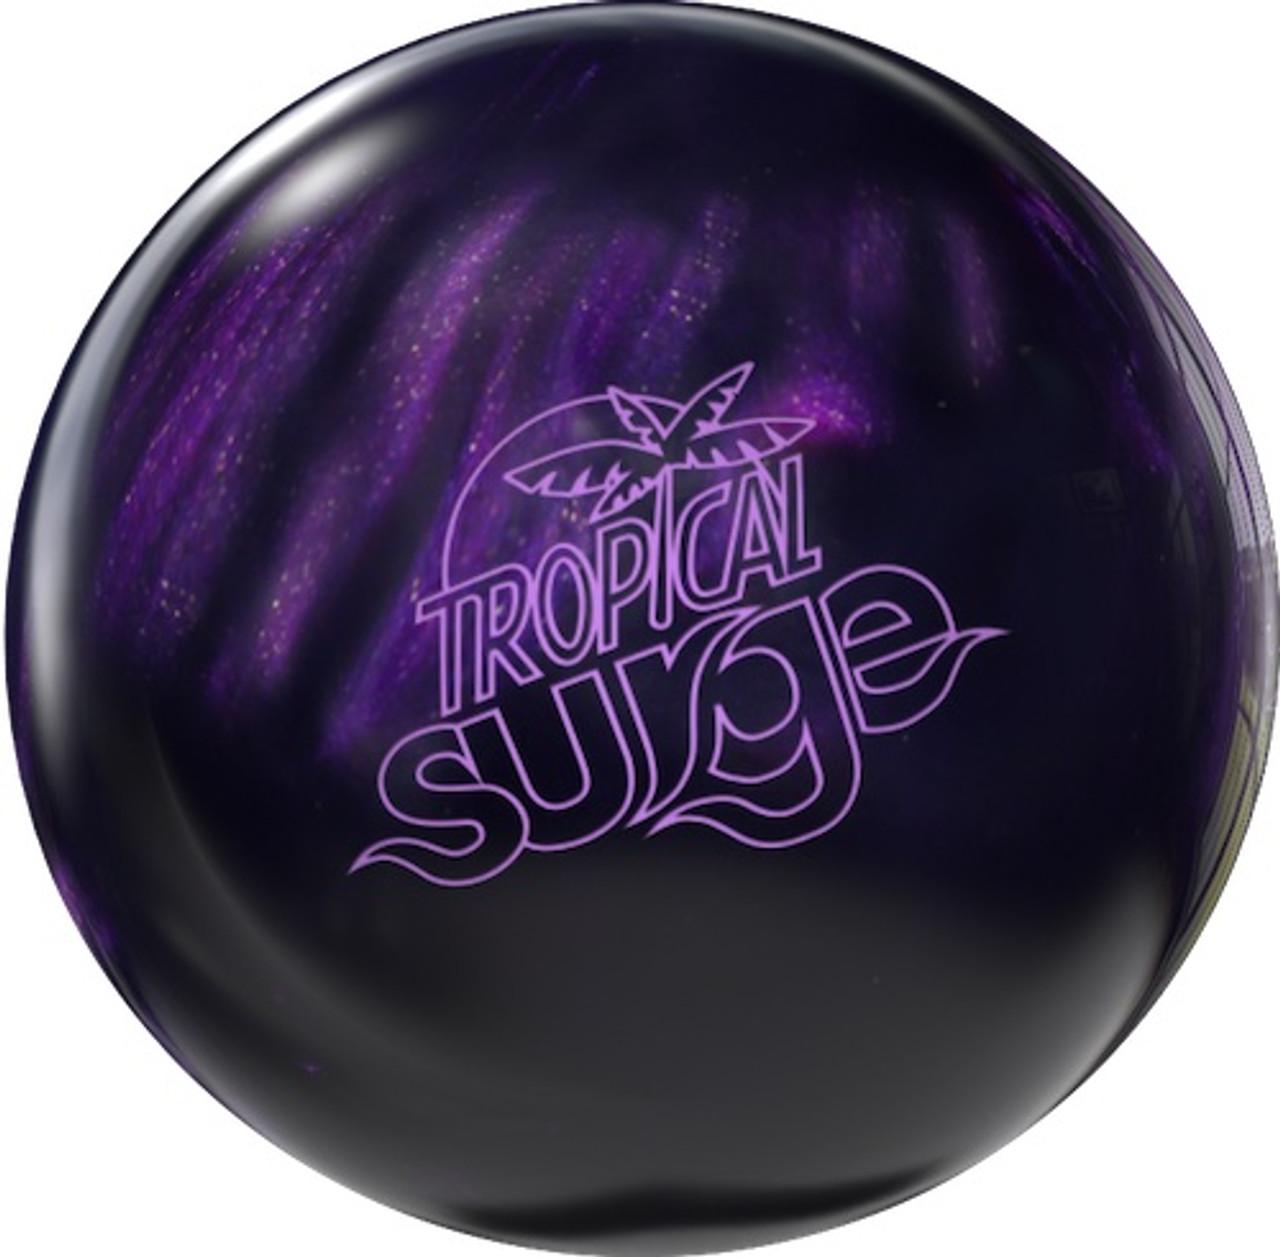 Storm Tropical Surge Purple Pearl Bowling Ball